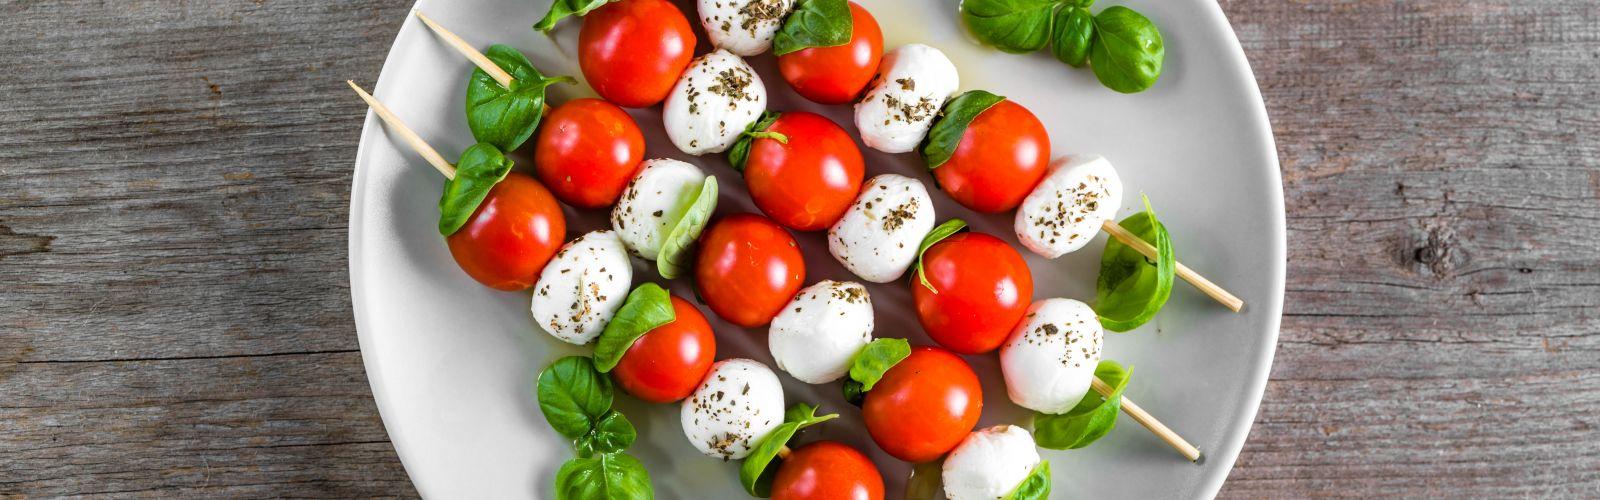 caprese salad on a skewer